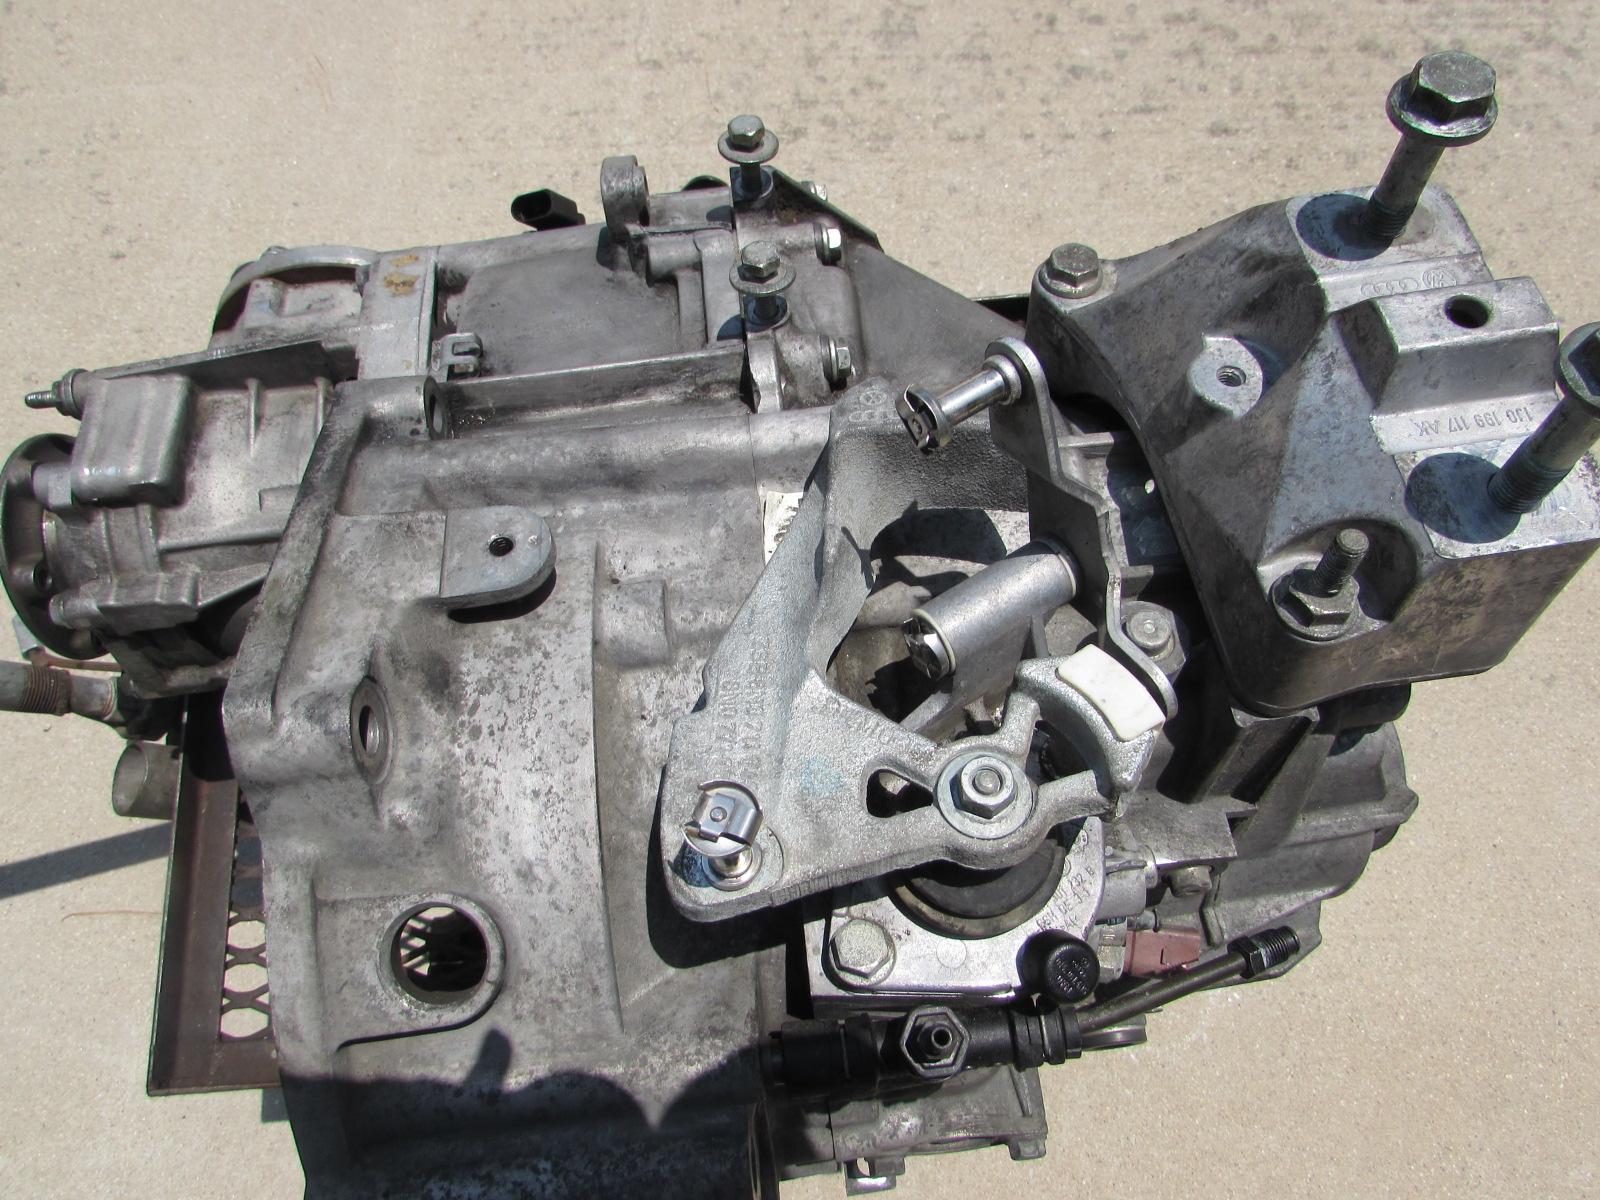 Tt Auto Sales >> Audi TT MK1 8N 6 Speed Quattro Transmission FMN w/ Transfer Case 02M300012KX - Hermes Auto Parts